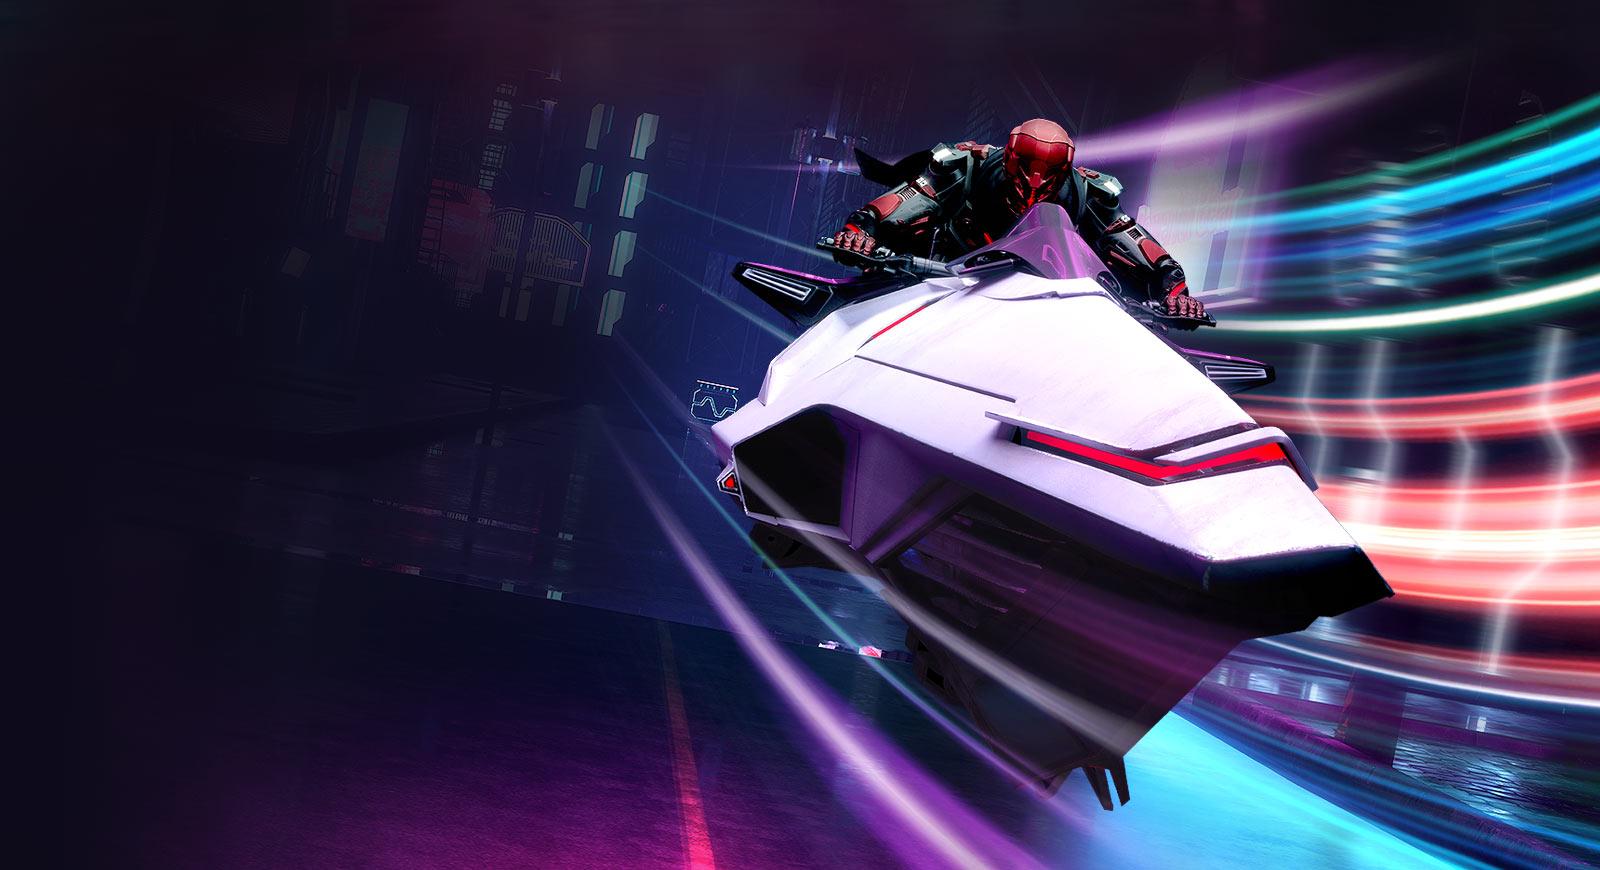 Gaming graphic demonstrating speed